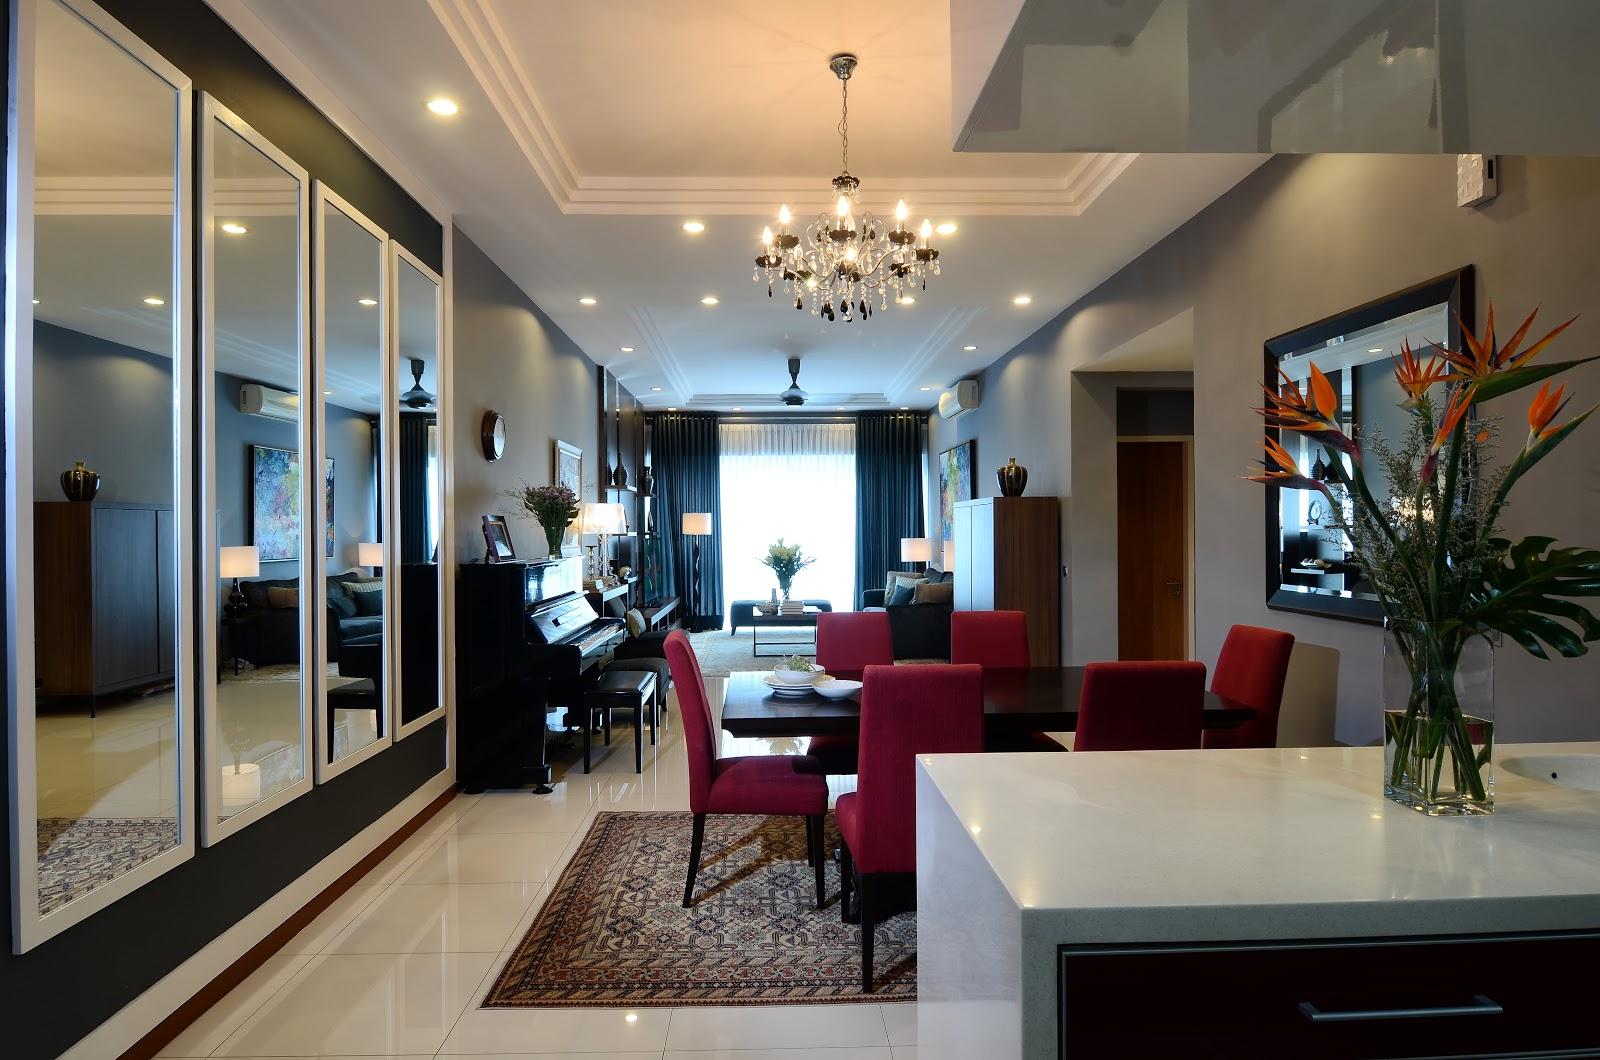 Sarang Interiors Modern Tropical Interior Design By: SARANG INTERIORS: INTERIOR DESIGN BY SARANG INTERIORS